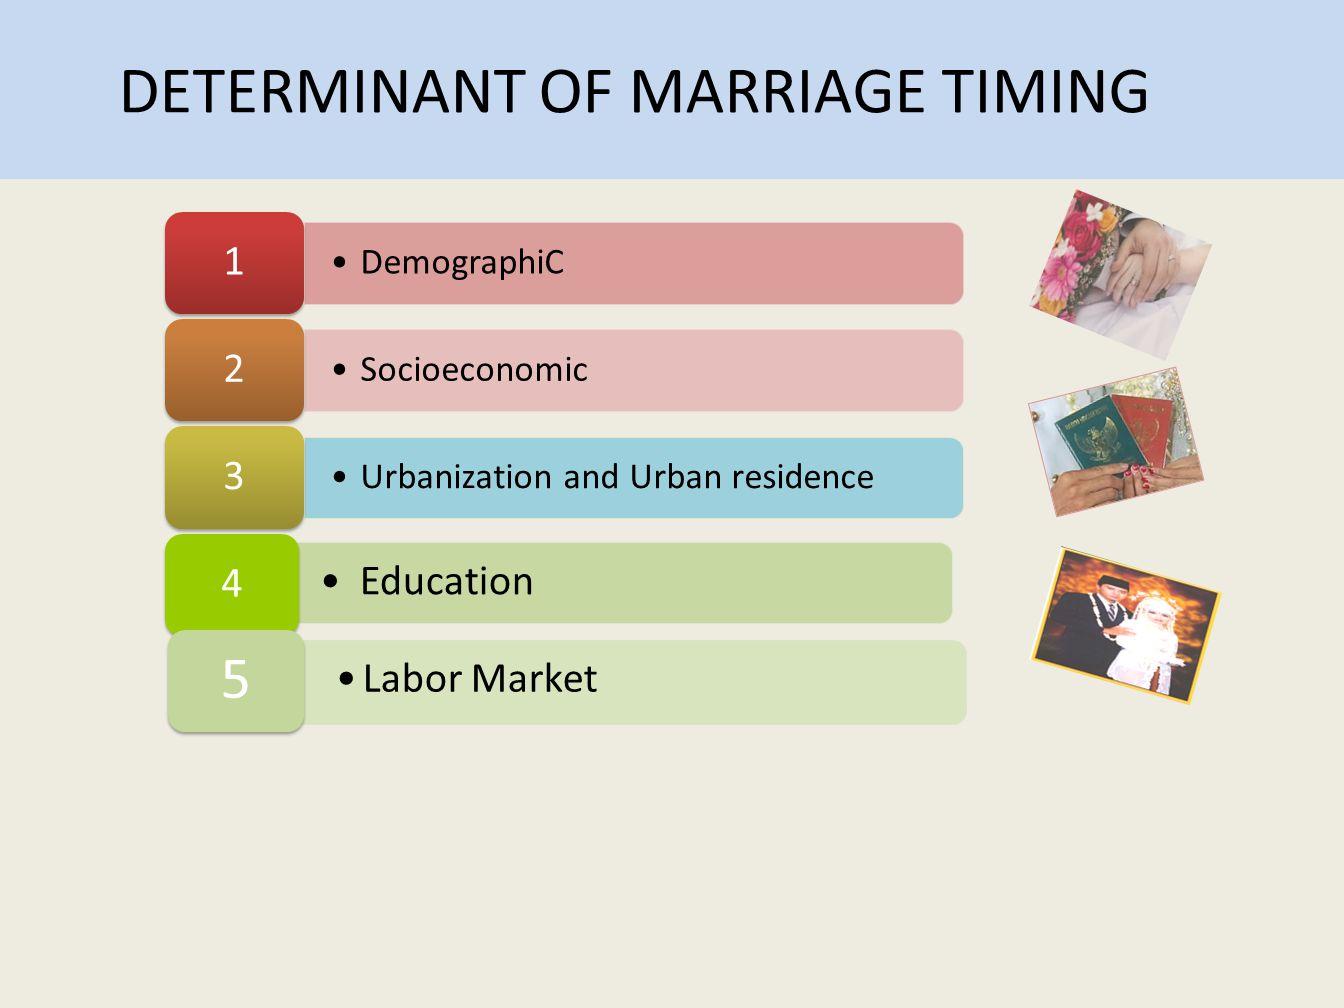 •DemographiC 1 •Socioeconomic 2 •Urbanization and Urban residence 3 • Education 4 DETERMINANT OF MARRIAGE TIMING •Labor Market 5